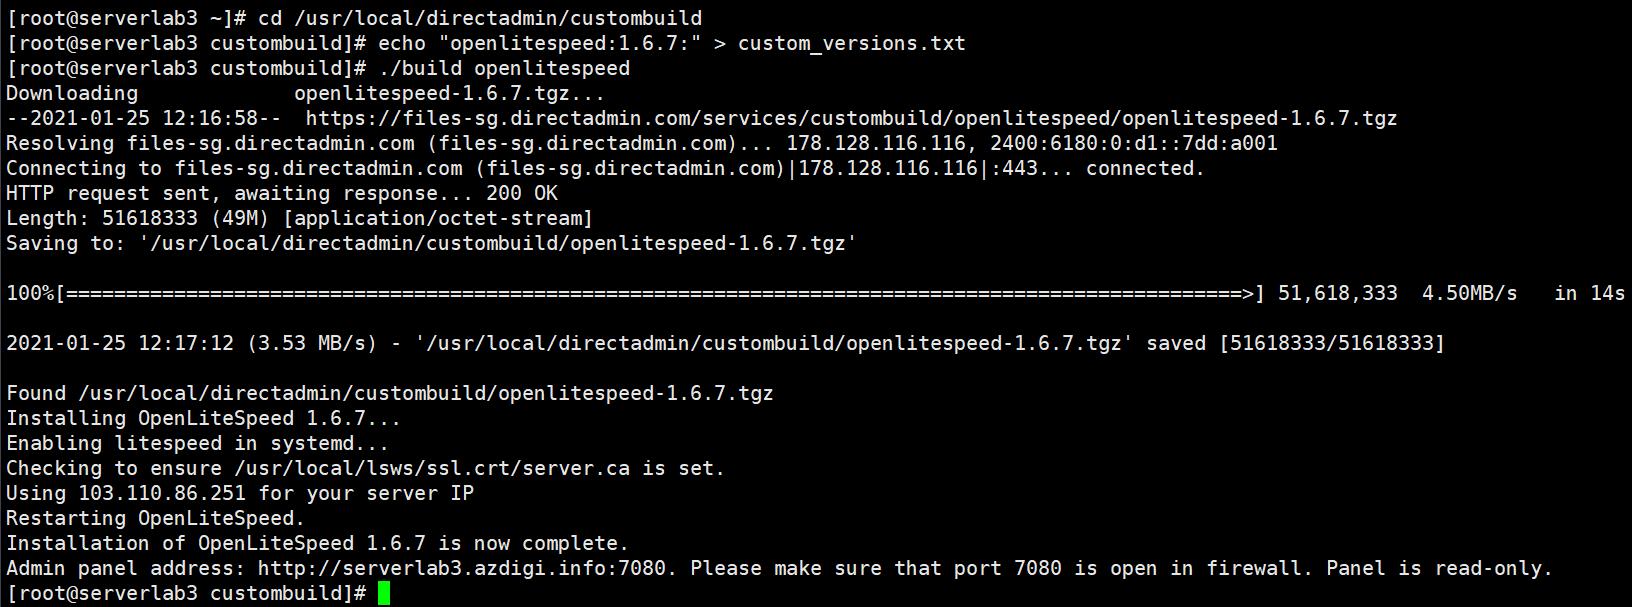 Nâng cấp phiên bản OpenLiteSpeed trên DirectAdmin